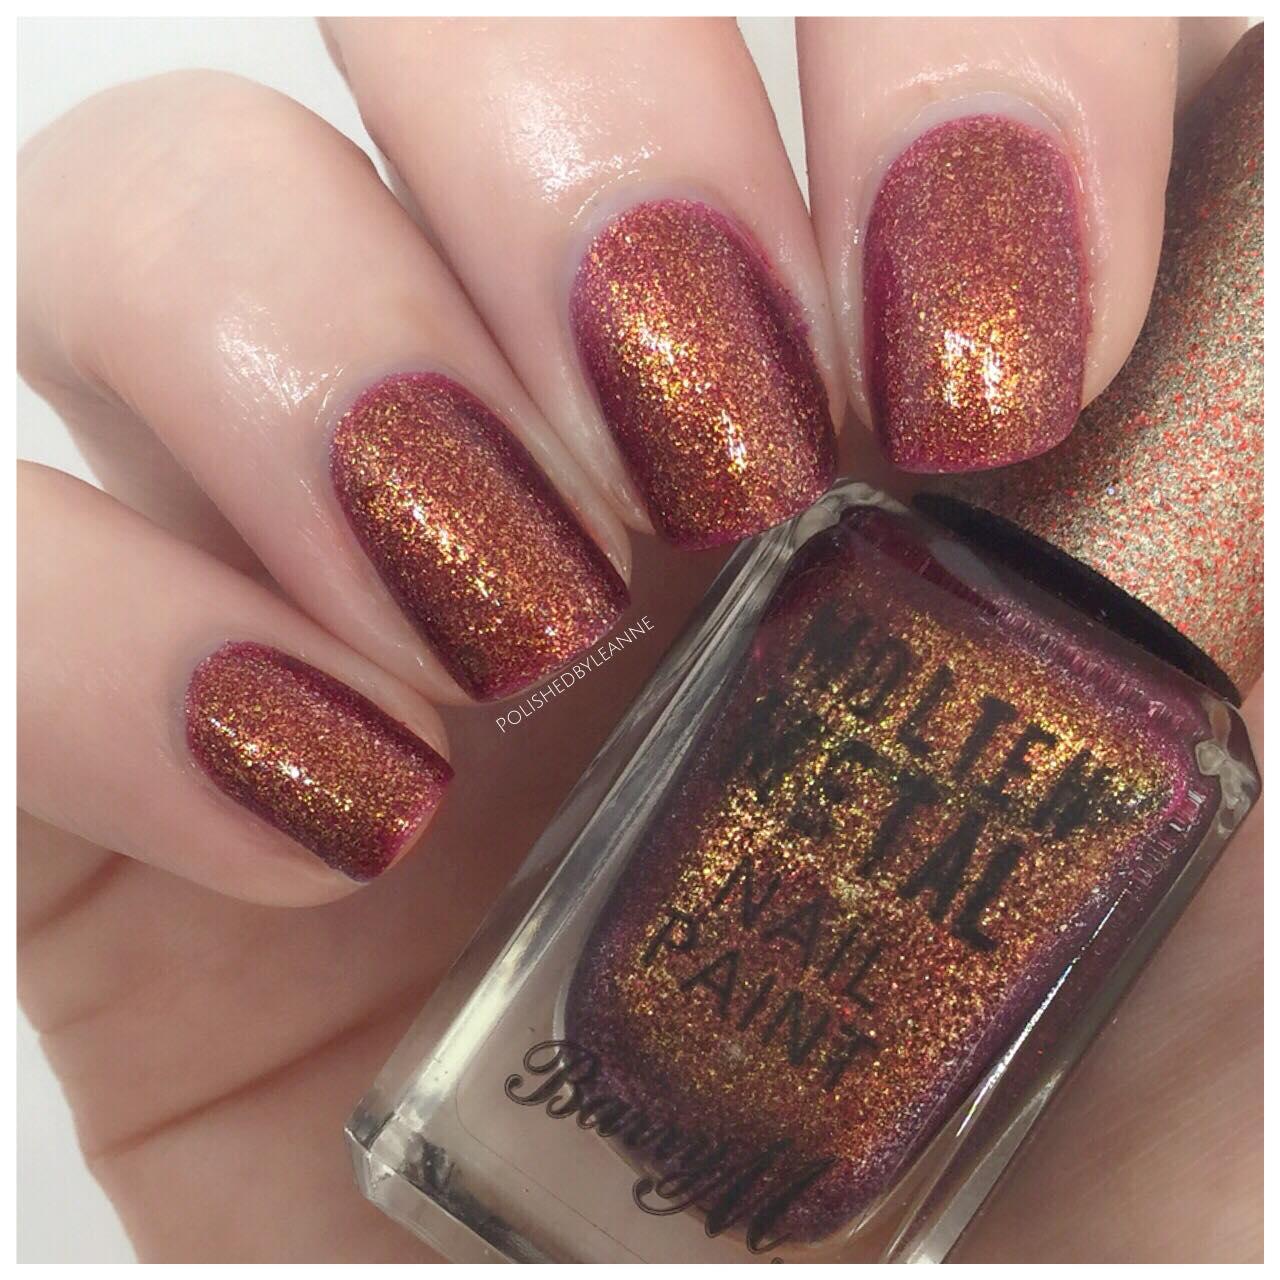 Antique Gold - Barry M